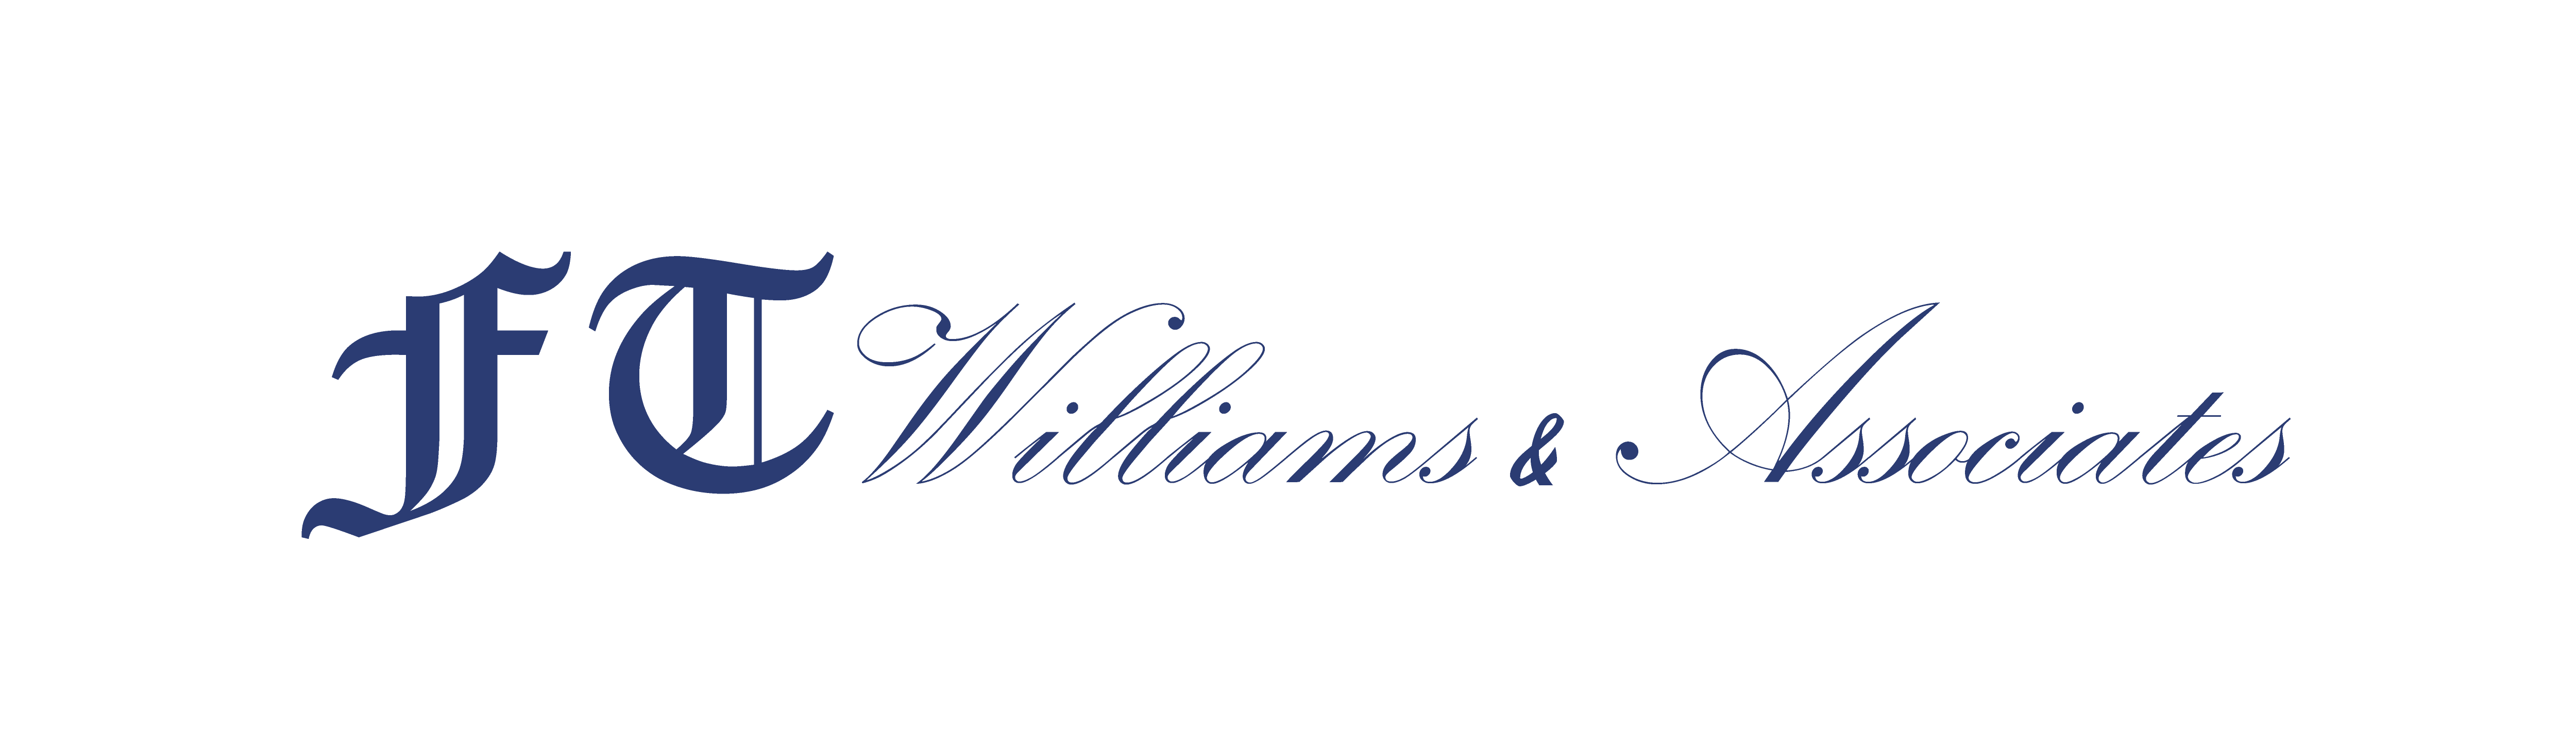 FT Williams & Associates